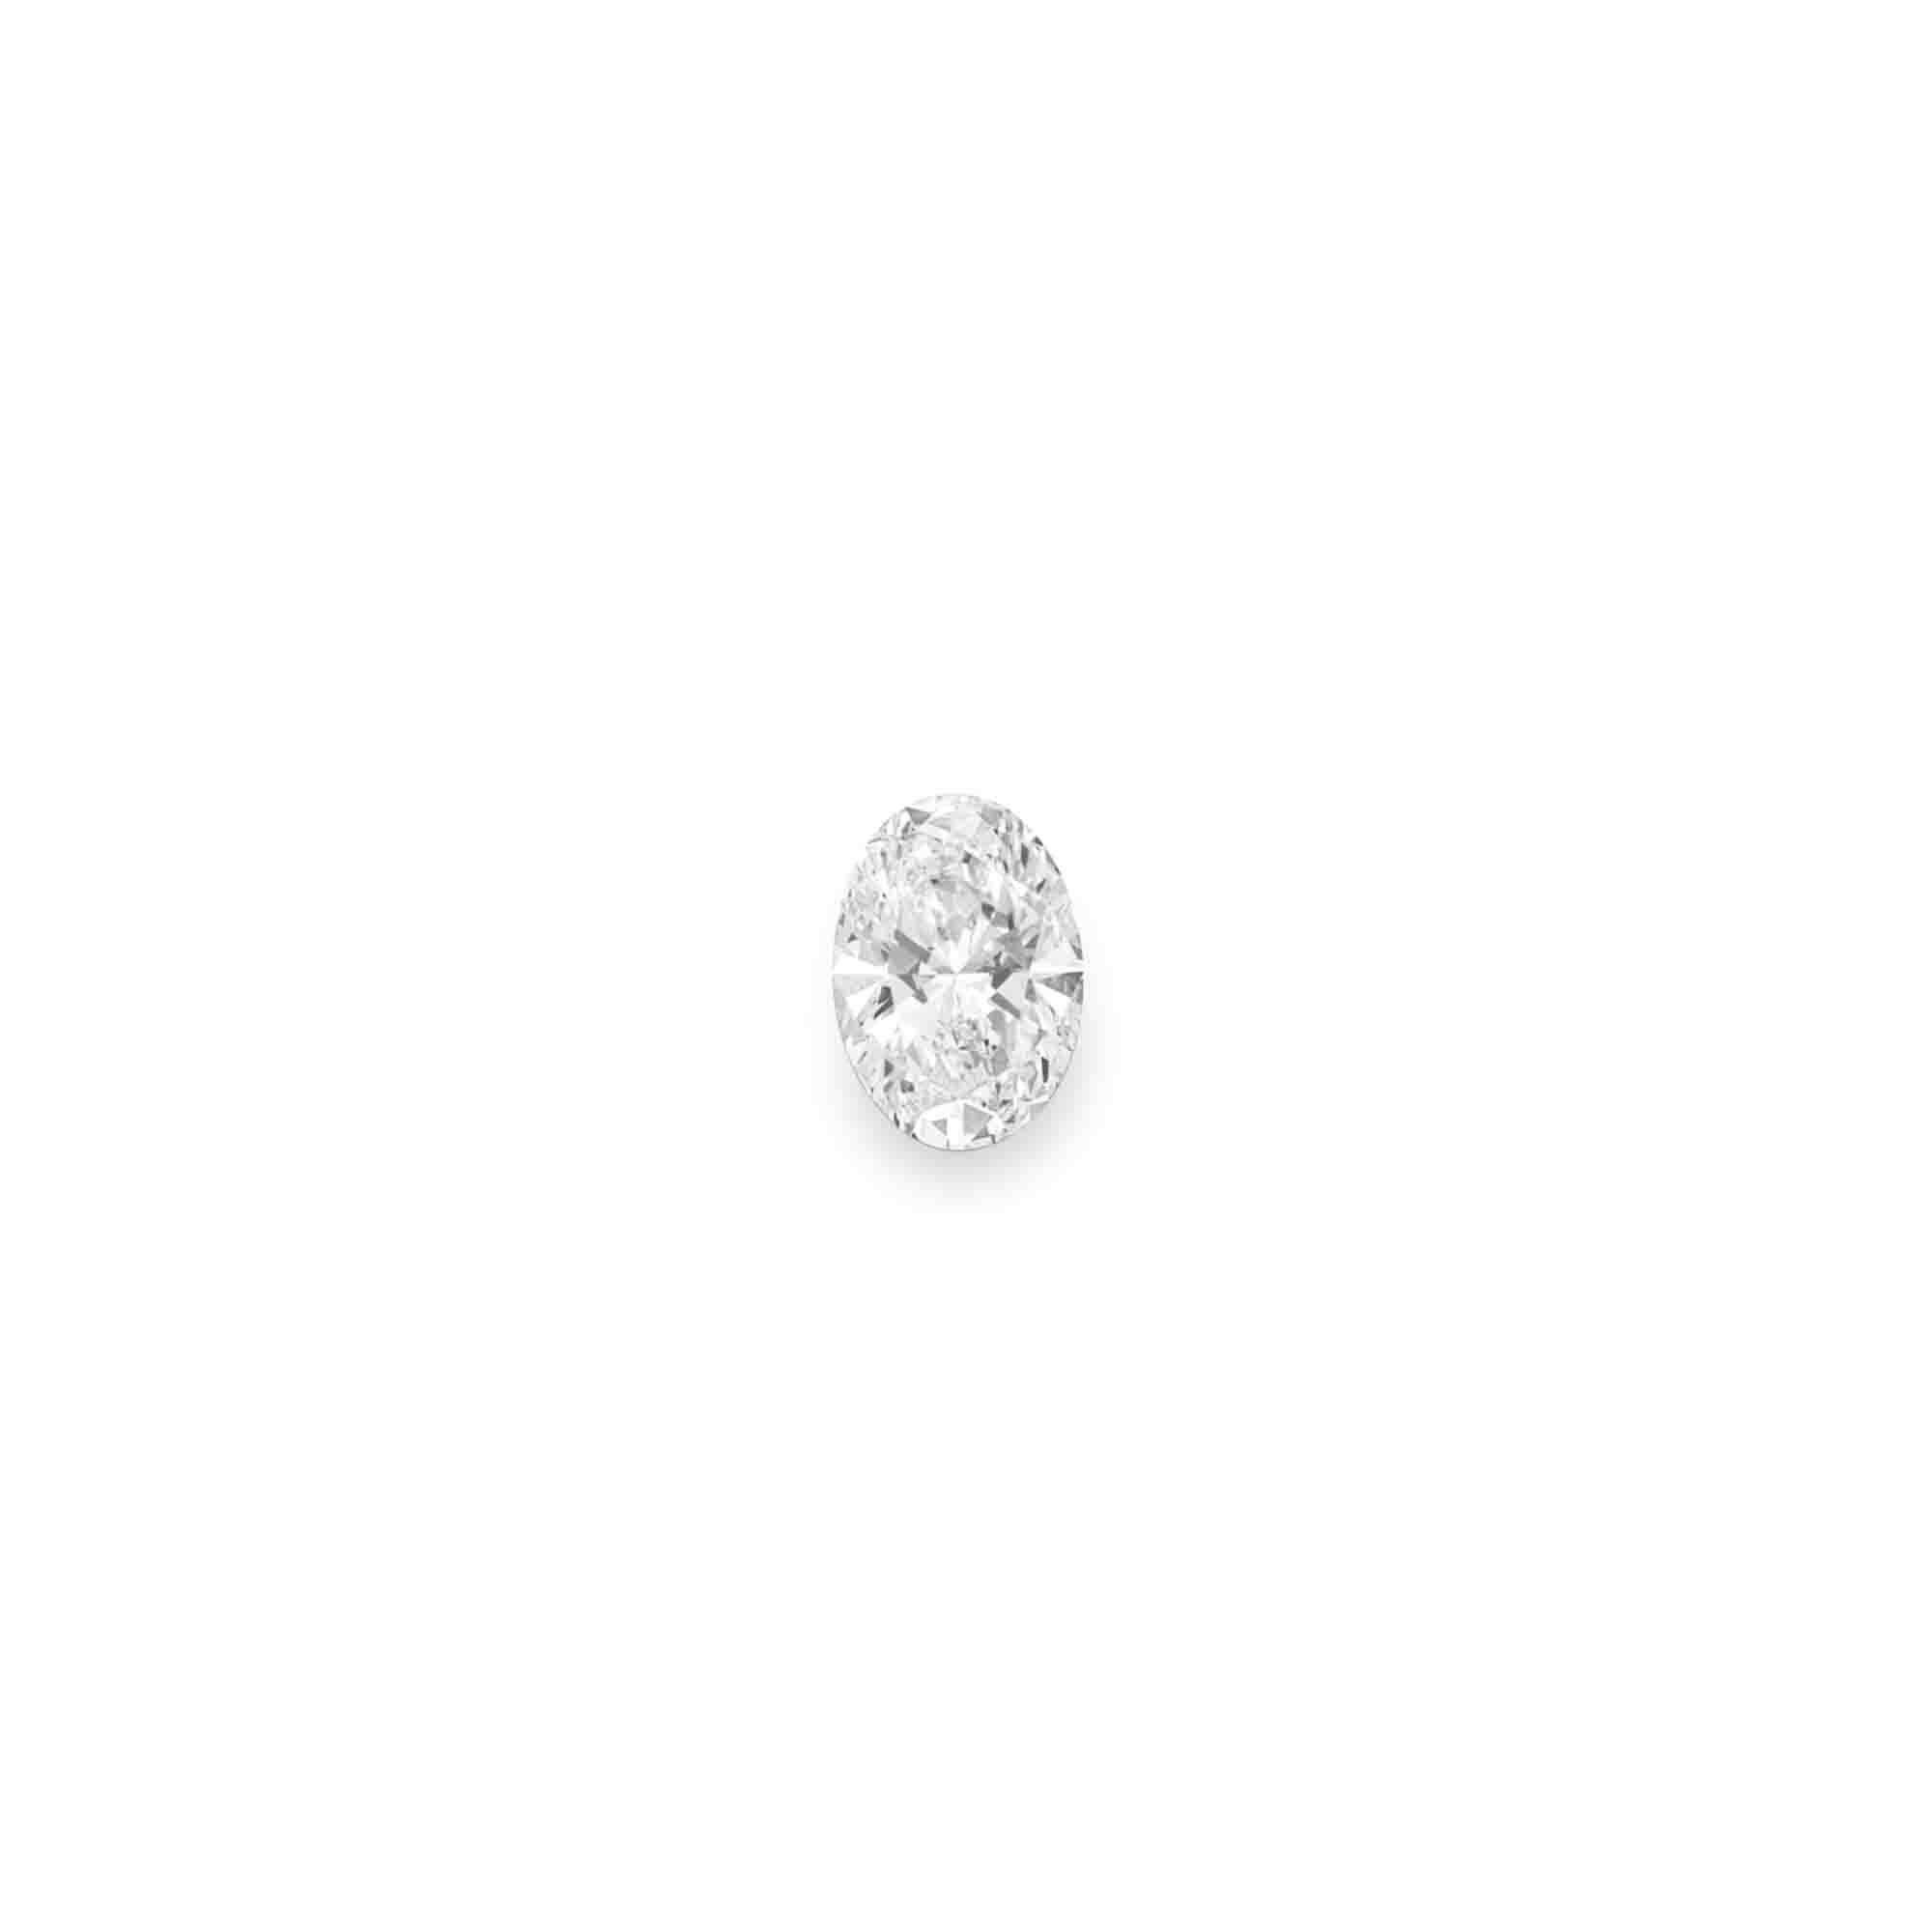 A DIAMOND RING, BY GRAFF